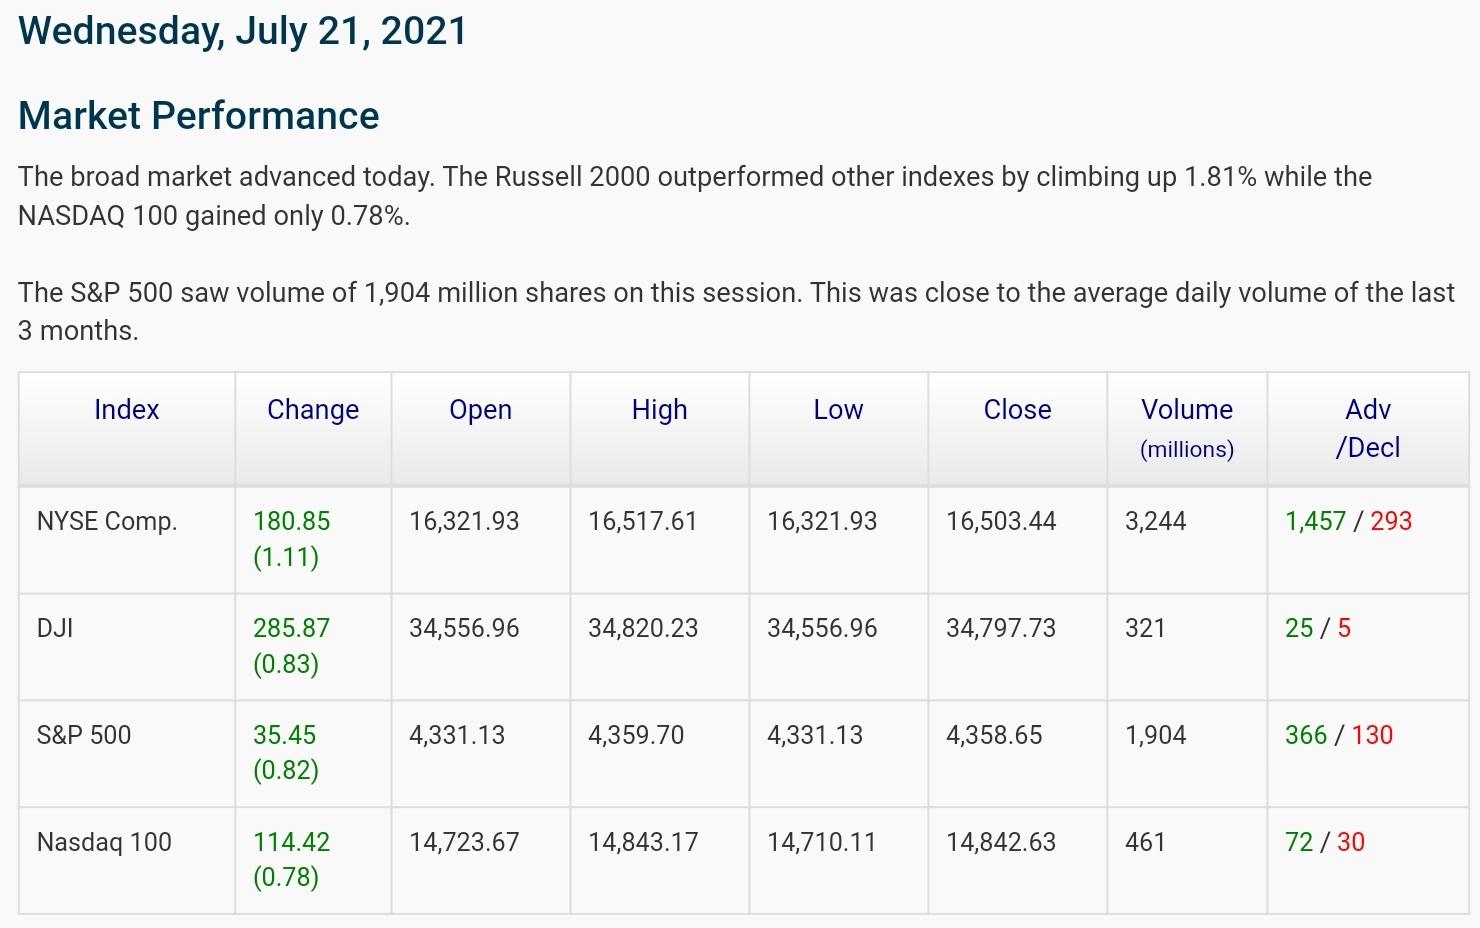 SmartSelect_20210722-151620_Samsung Internet.jpg